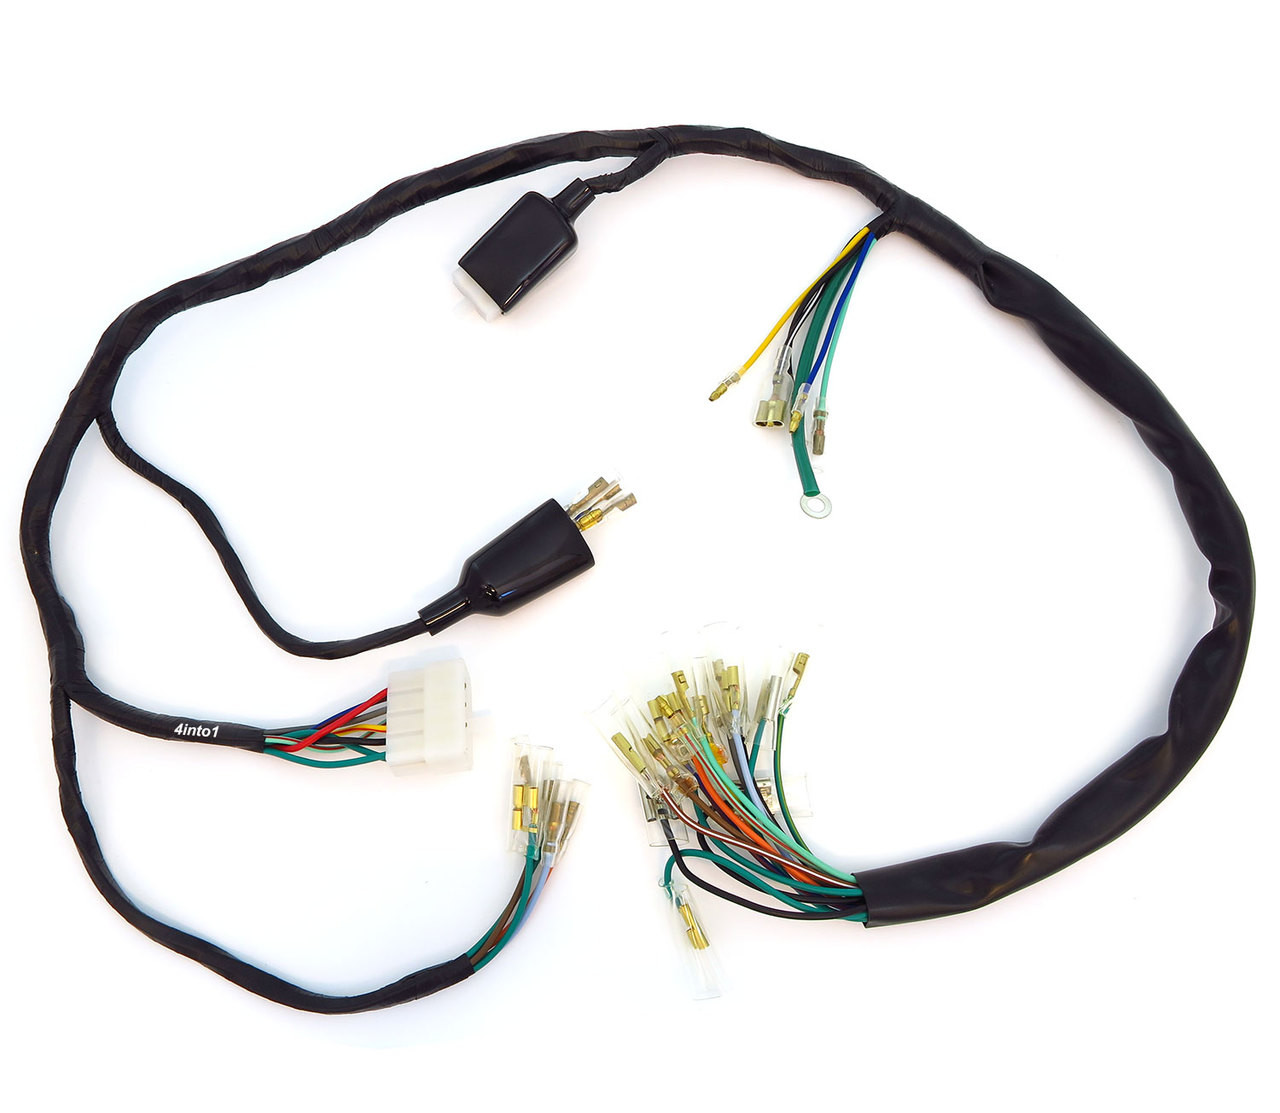 hight resolution of main wiring harness 32100 323 040 honda cb500k 1972 1973 honda wiring harness connectors honda wiring harness